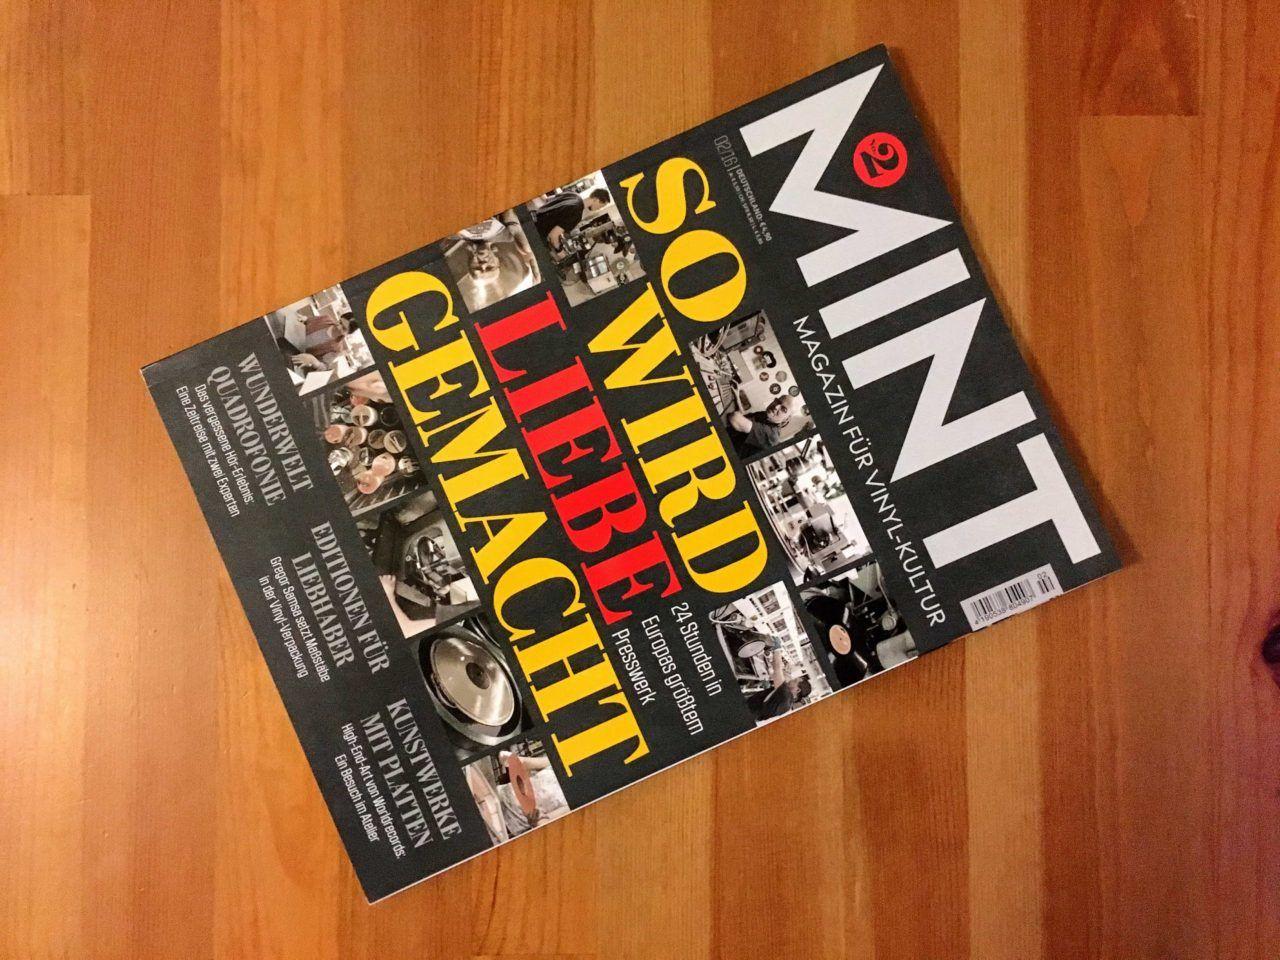 Mint - Ausgabe 02 - Magazin für Vinyl-Kultur